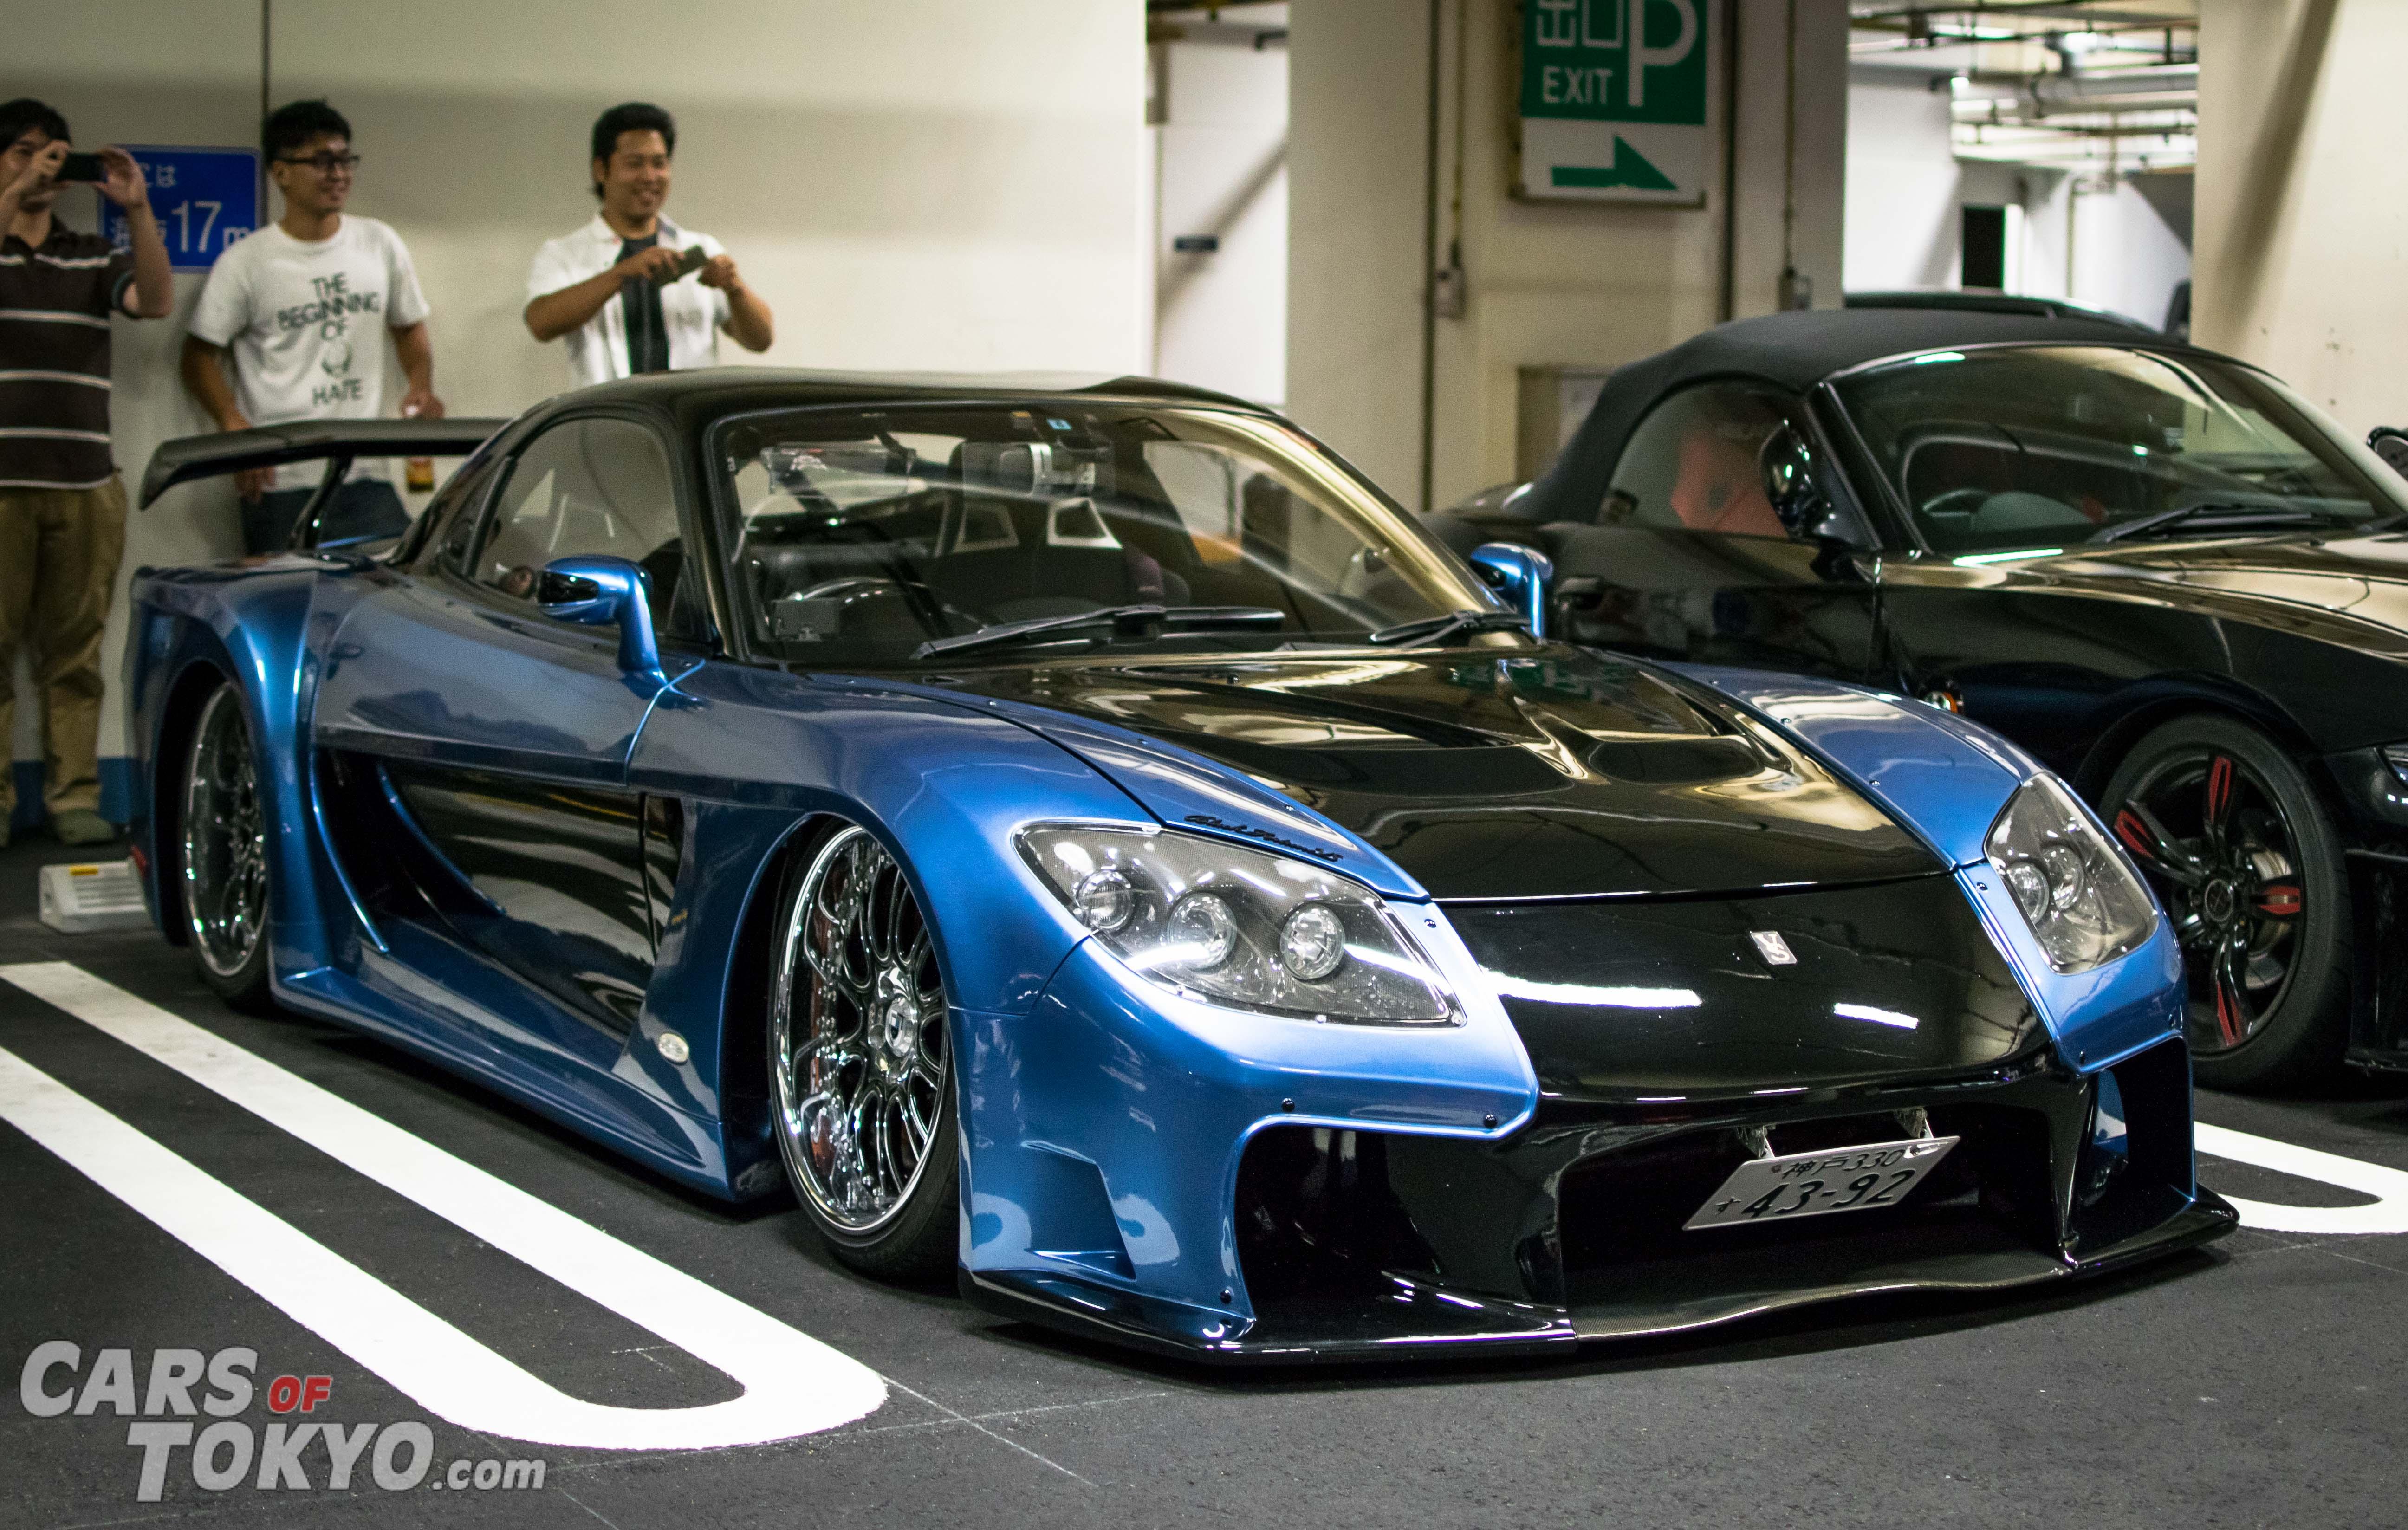 Cars of Tokyo Mazda RX7 Veilside